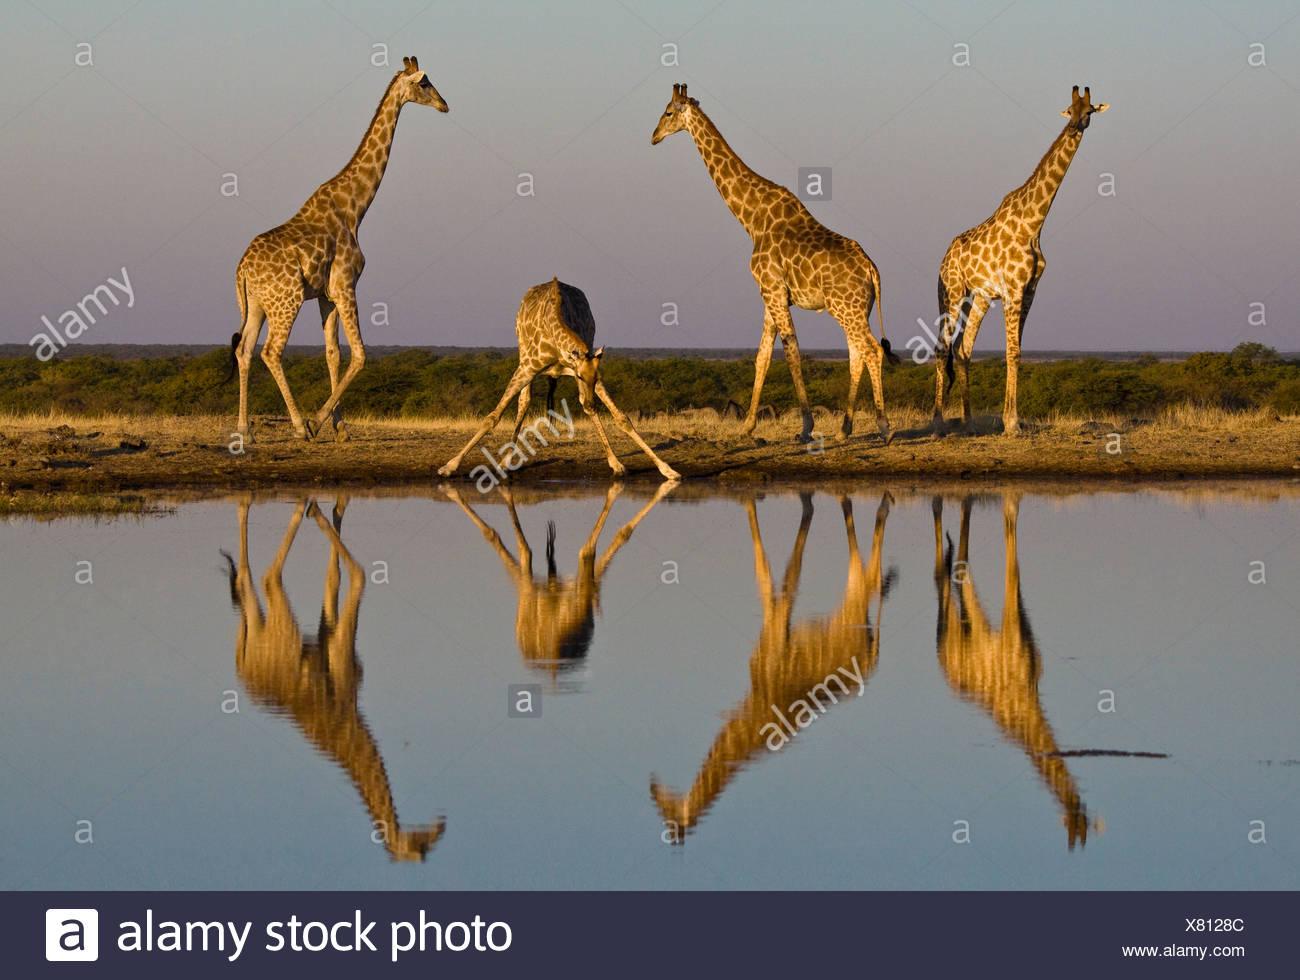 Girafe à trou d'eau, ce qui se reflète dans l'eau, d'Etosha, Namibie Photo Stock